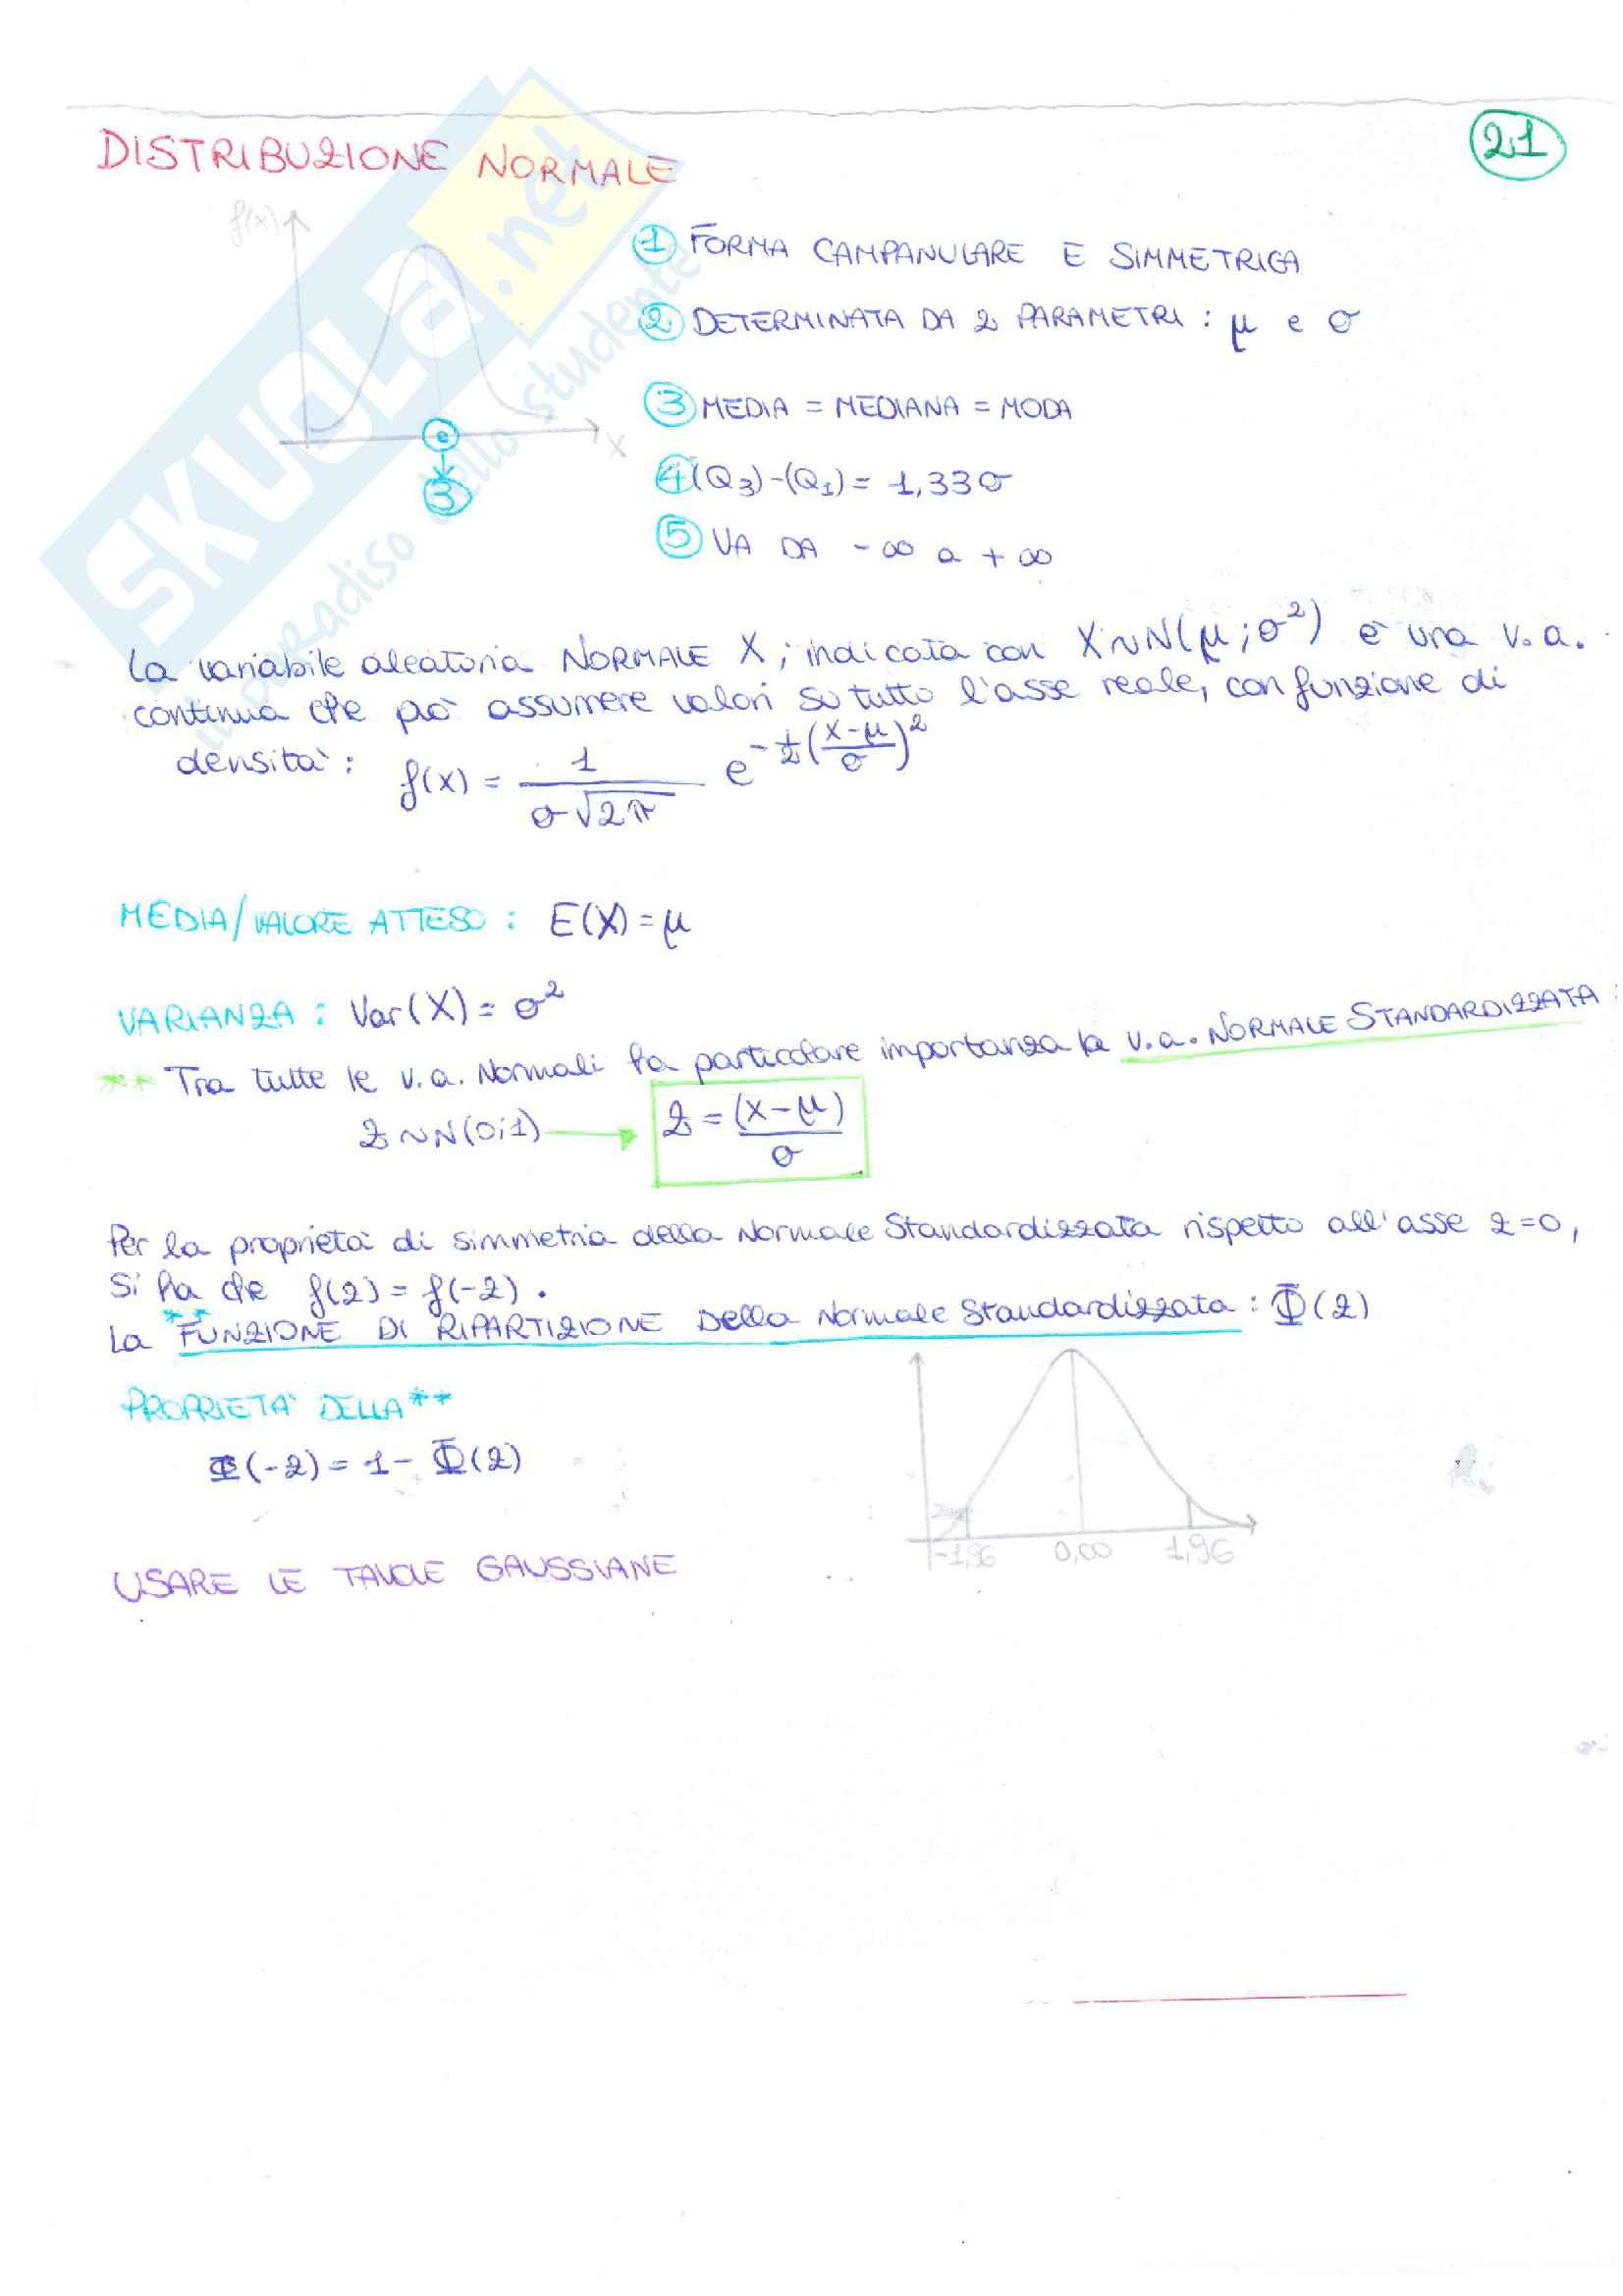 Appunti Statistica Pag. 21